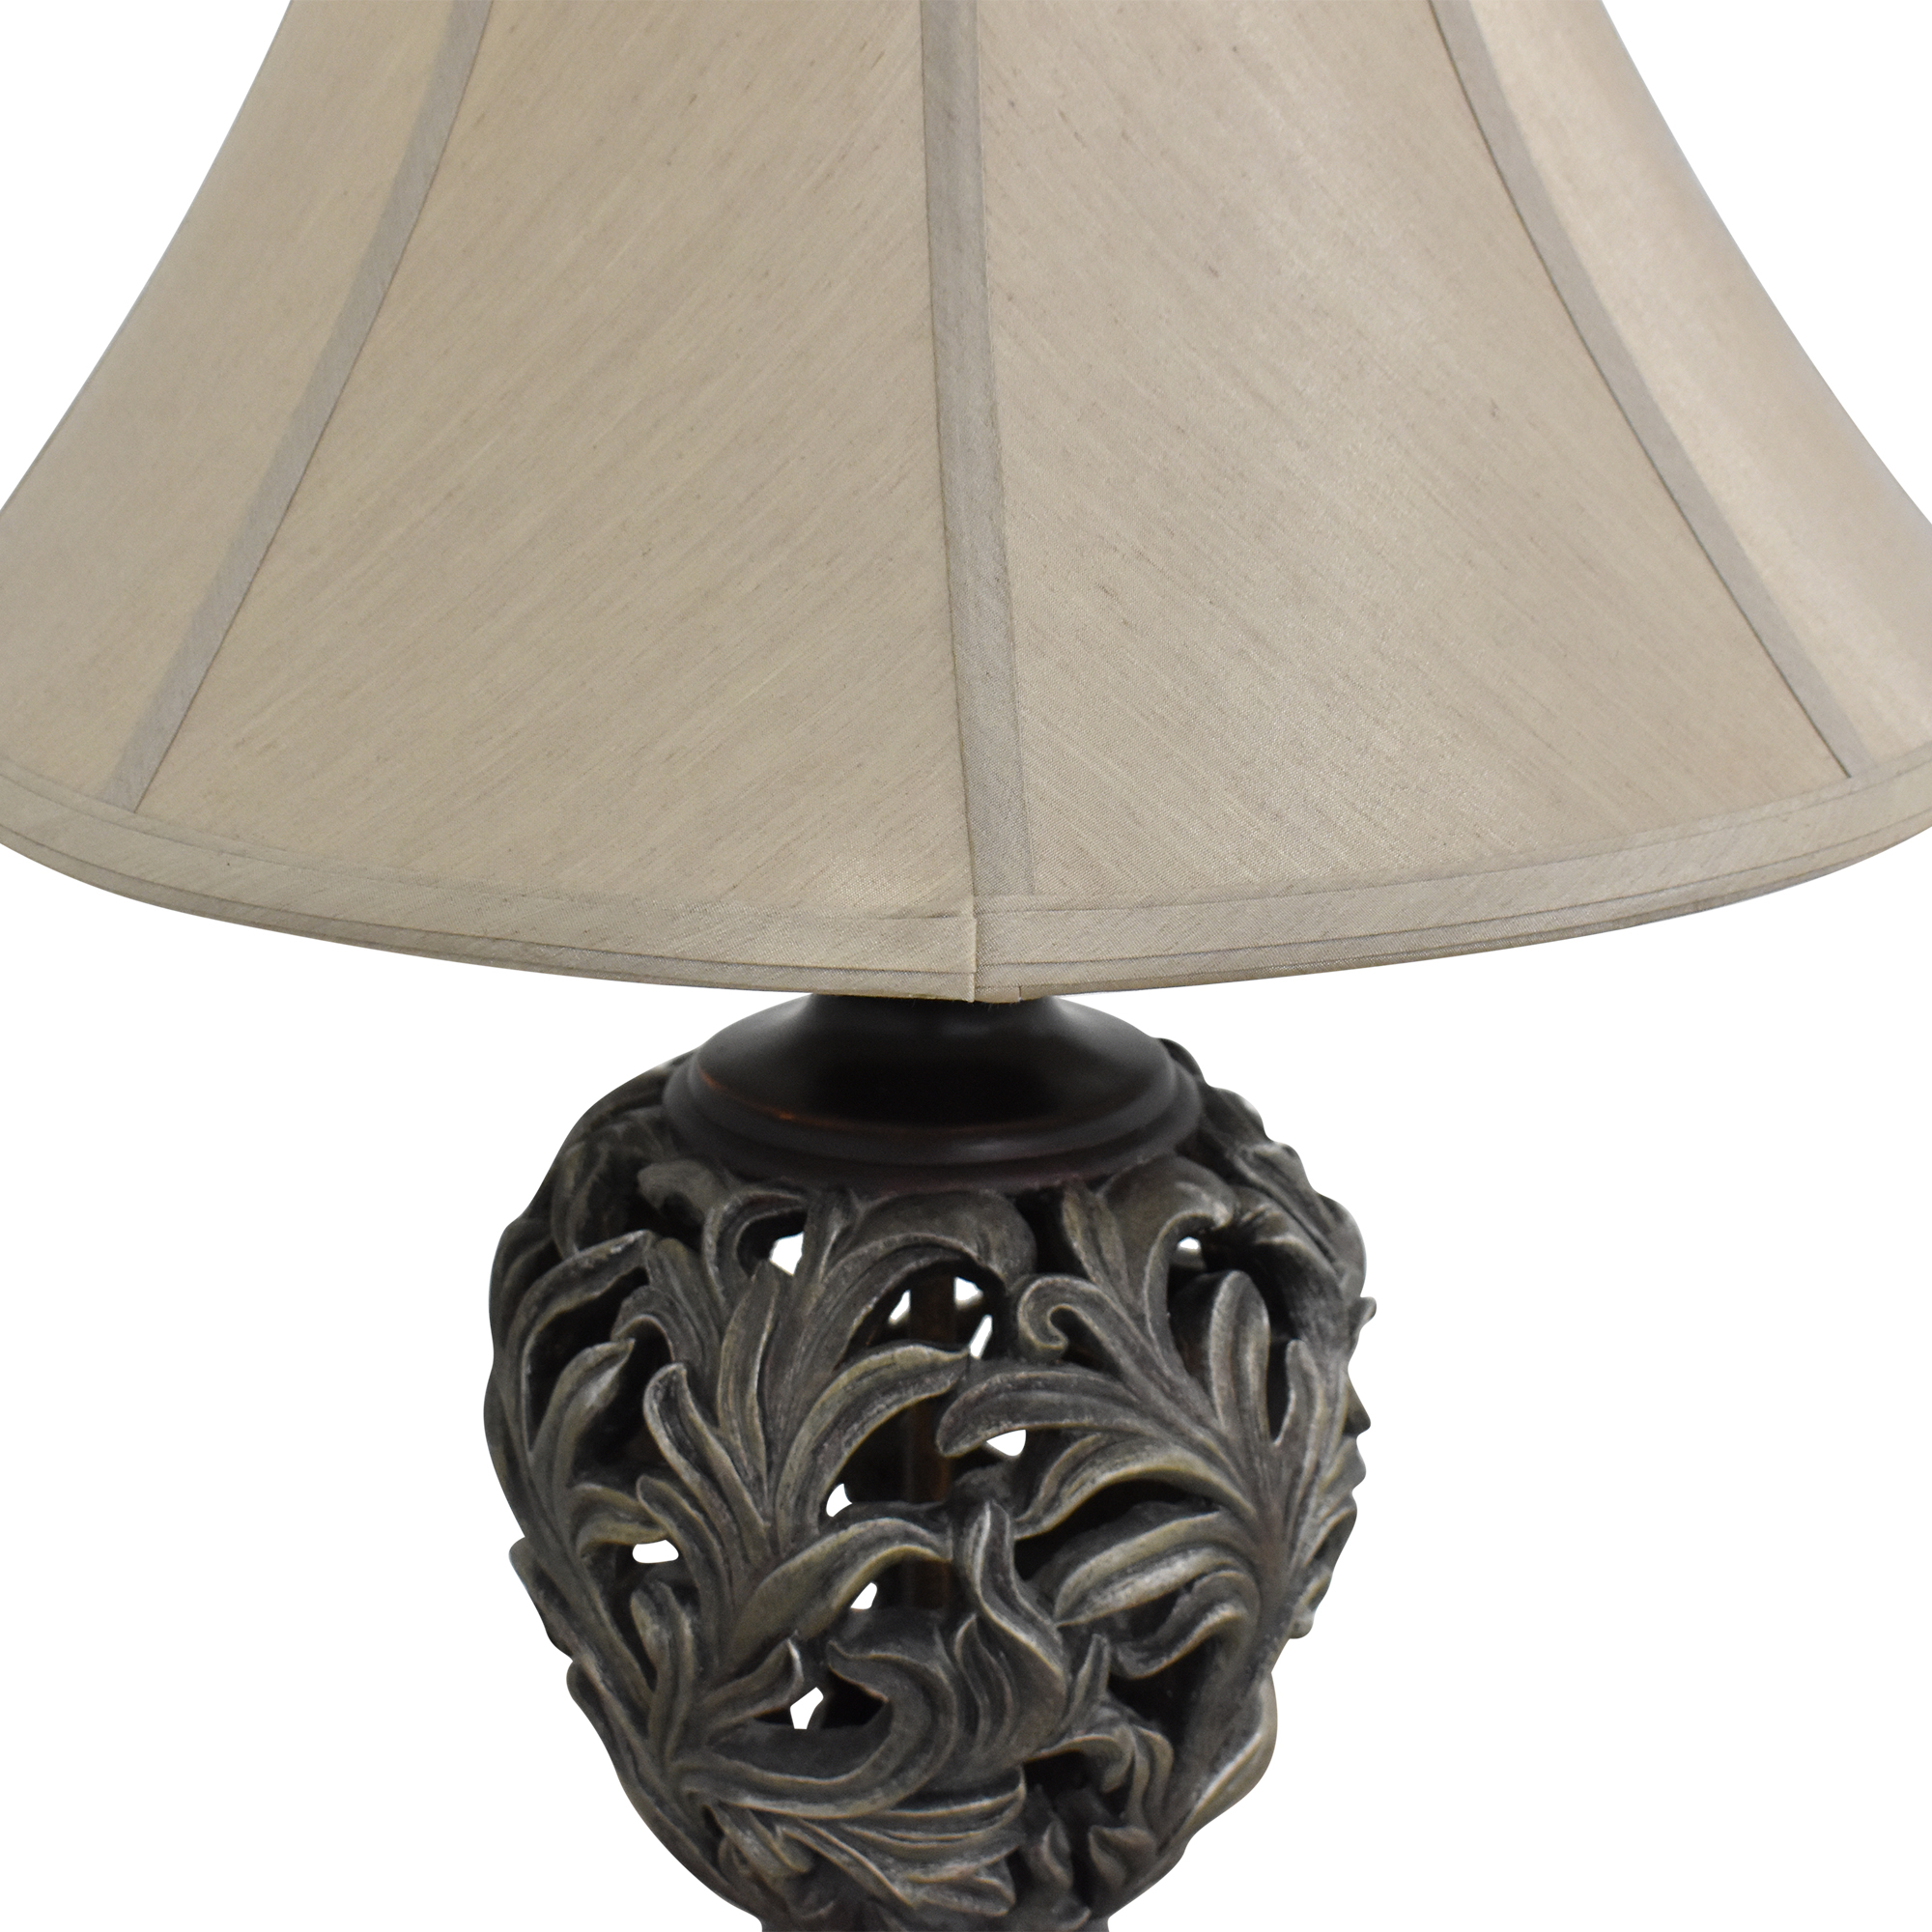 Ashley Furniture Ashley Furniture Deborah Table Lamp Decor